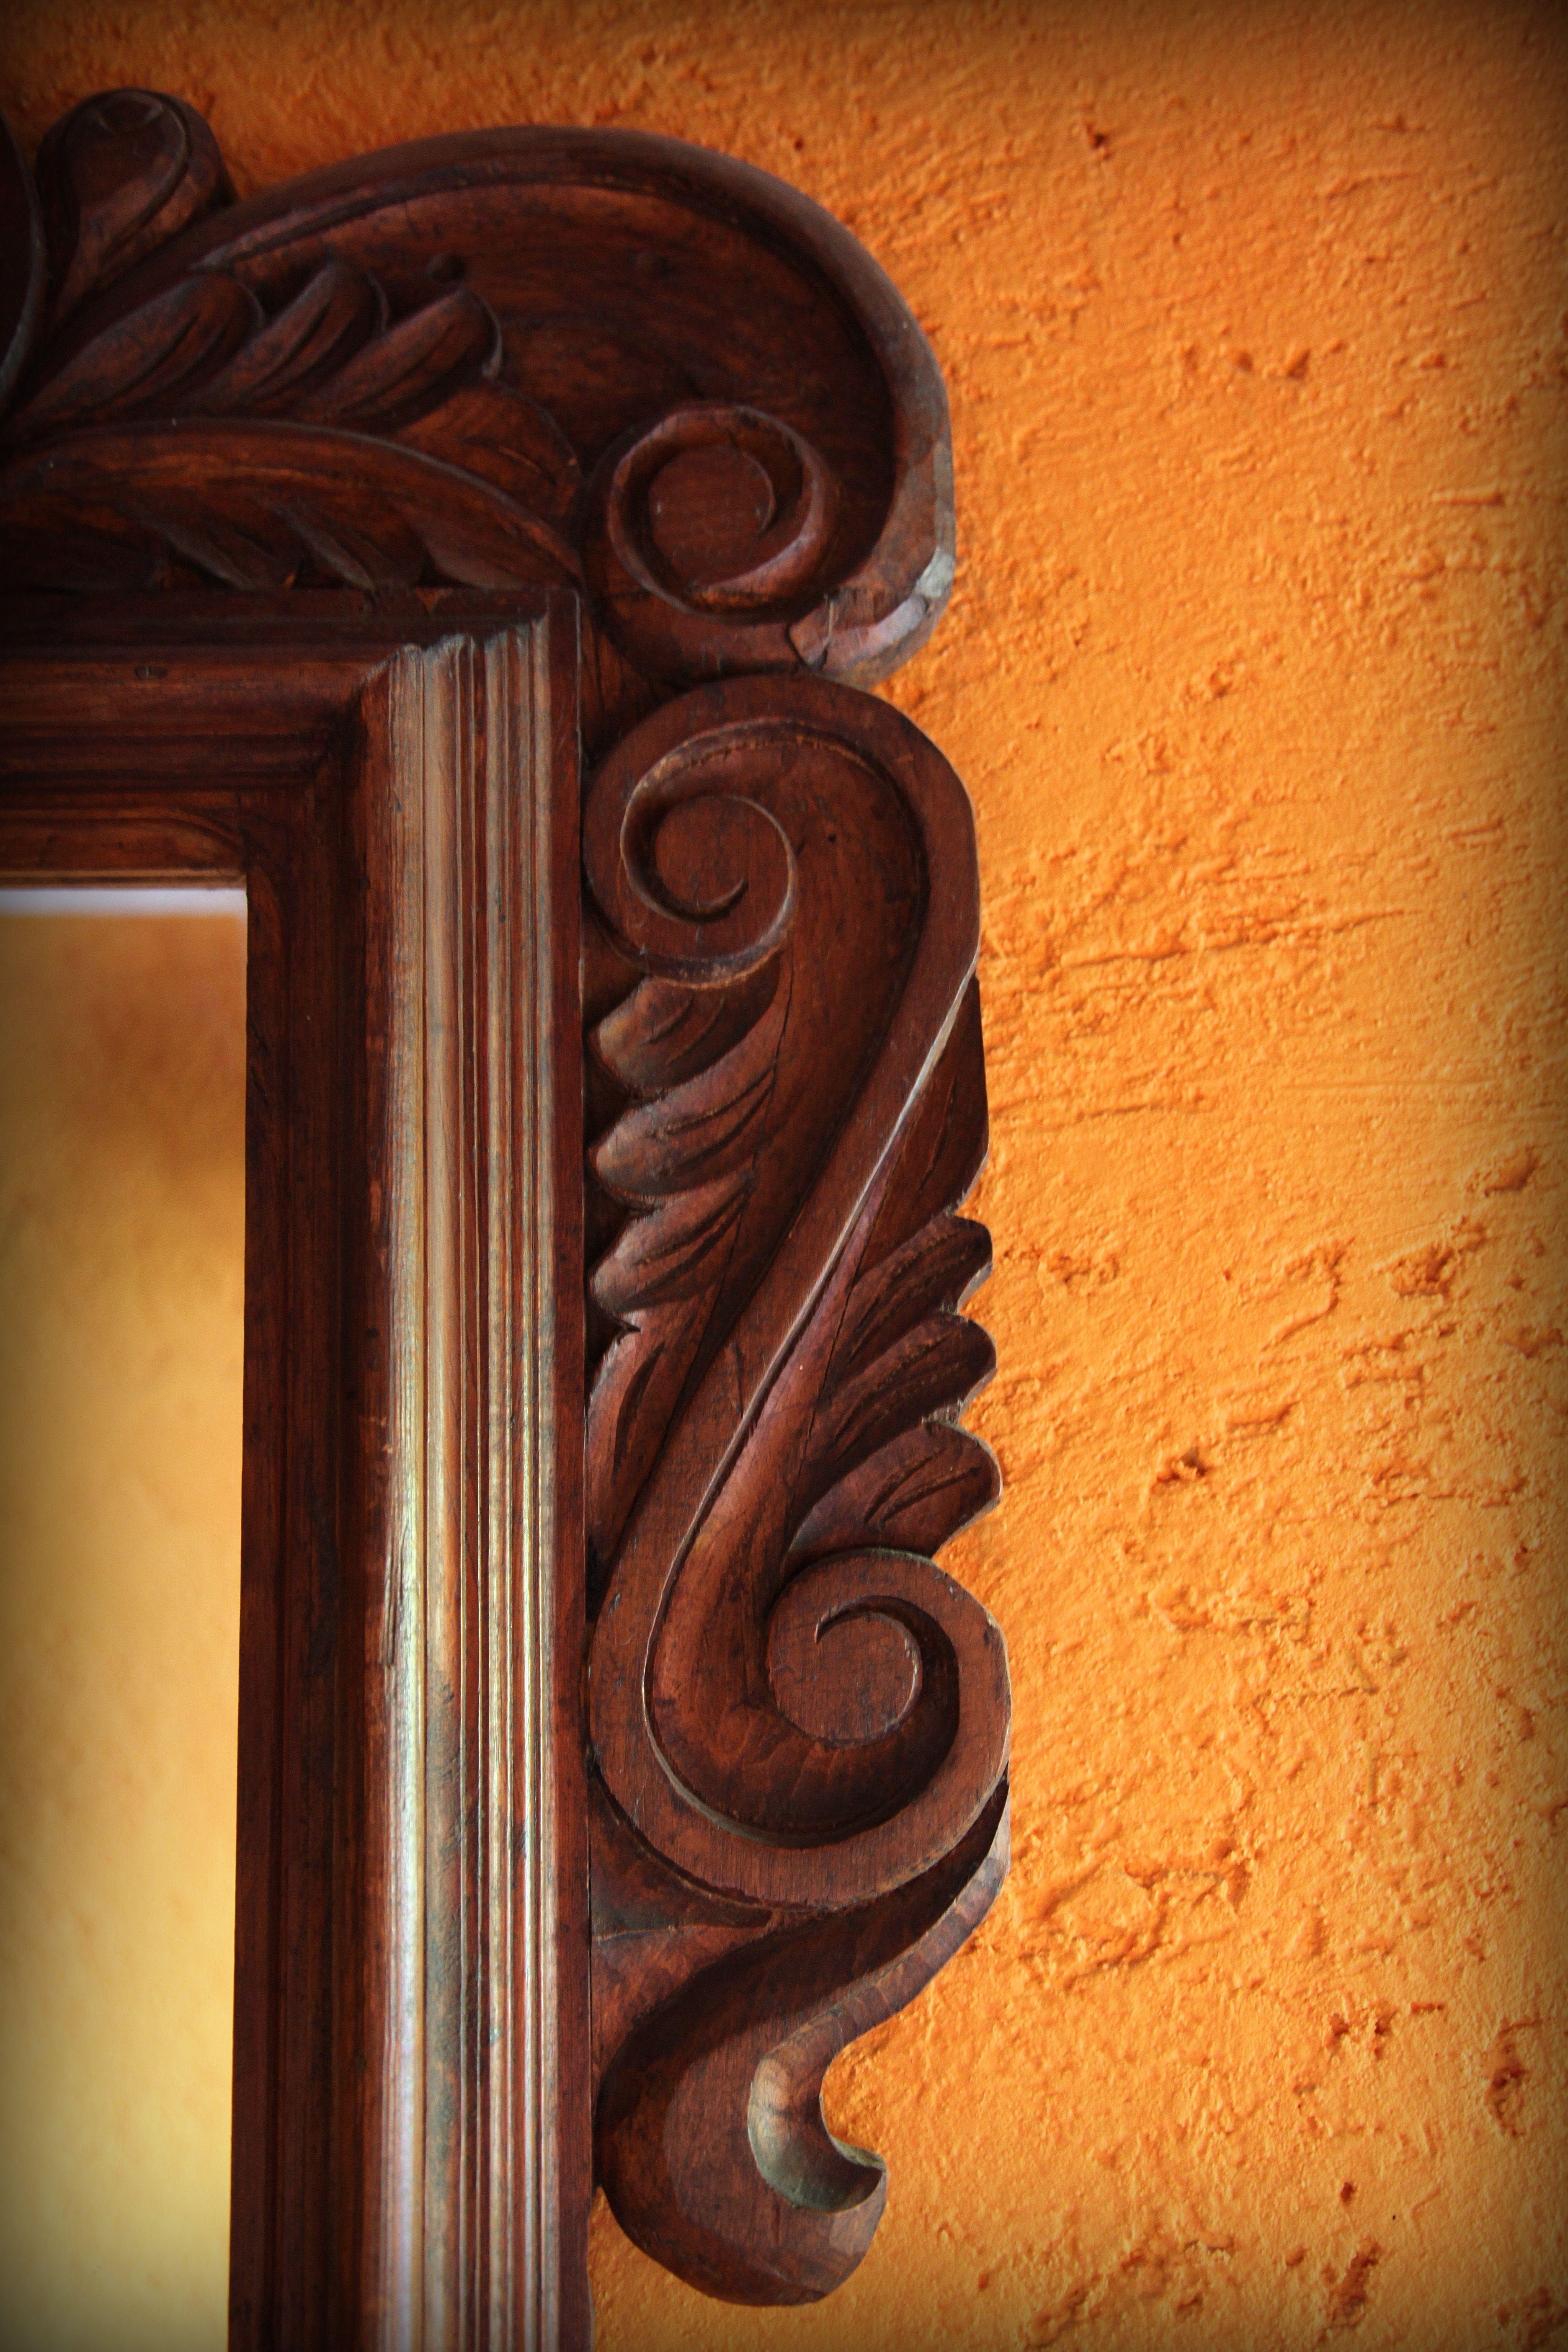 Marcos de madera, 100% arte mexicano. | detalles | Pinterest ...